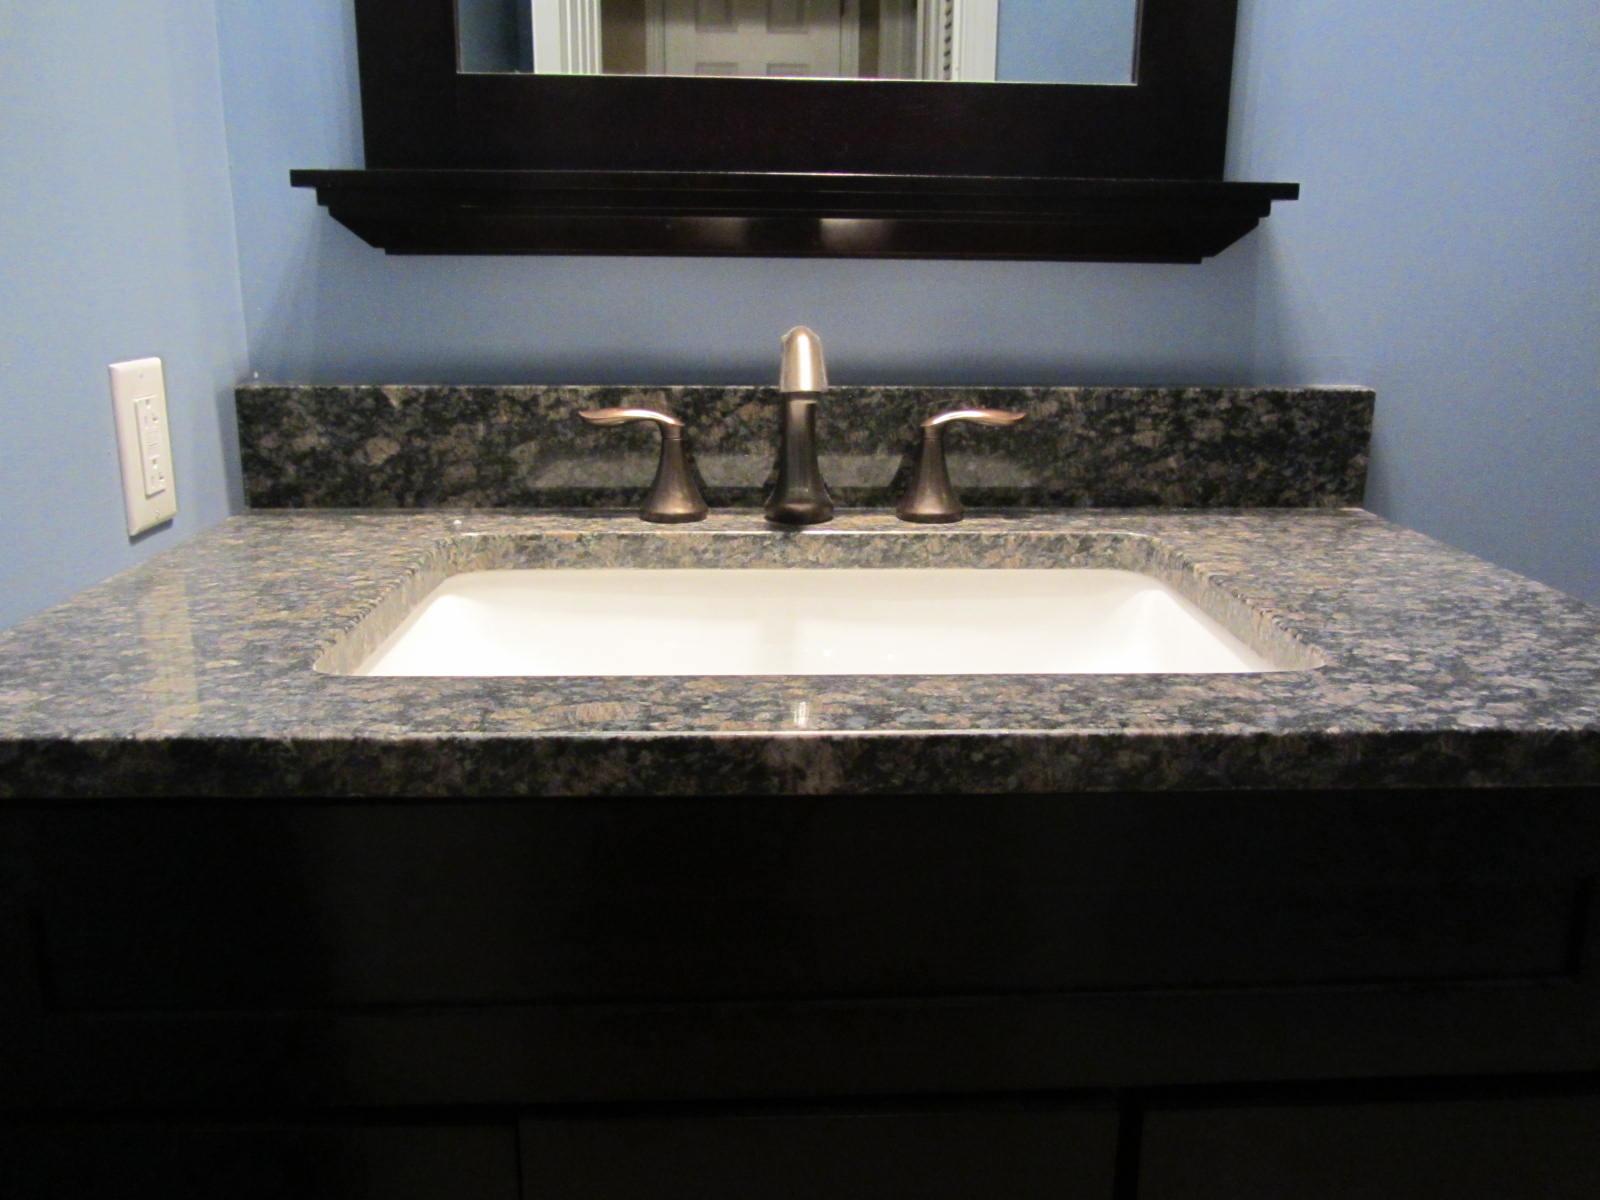 Hot Selling Product Hotel Vanity Top Prefab Slab Granite Bathroom Vanity Buy Granite Bathroom Vanity Hotel Vanity Granite Top Vanity Prefab Slab Granite Product On Alibaba Com